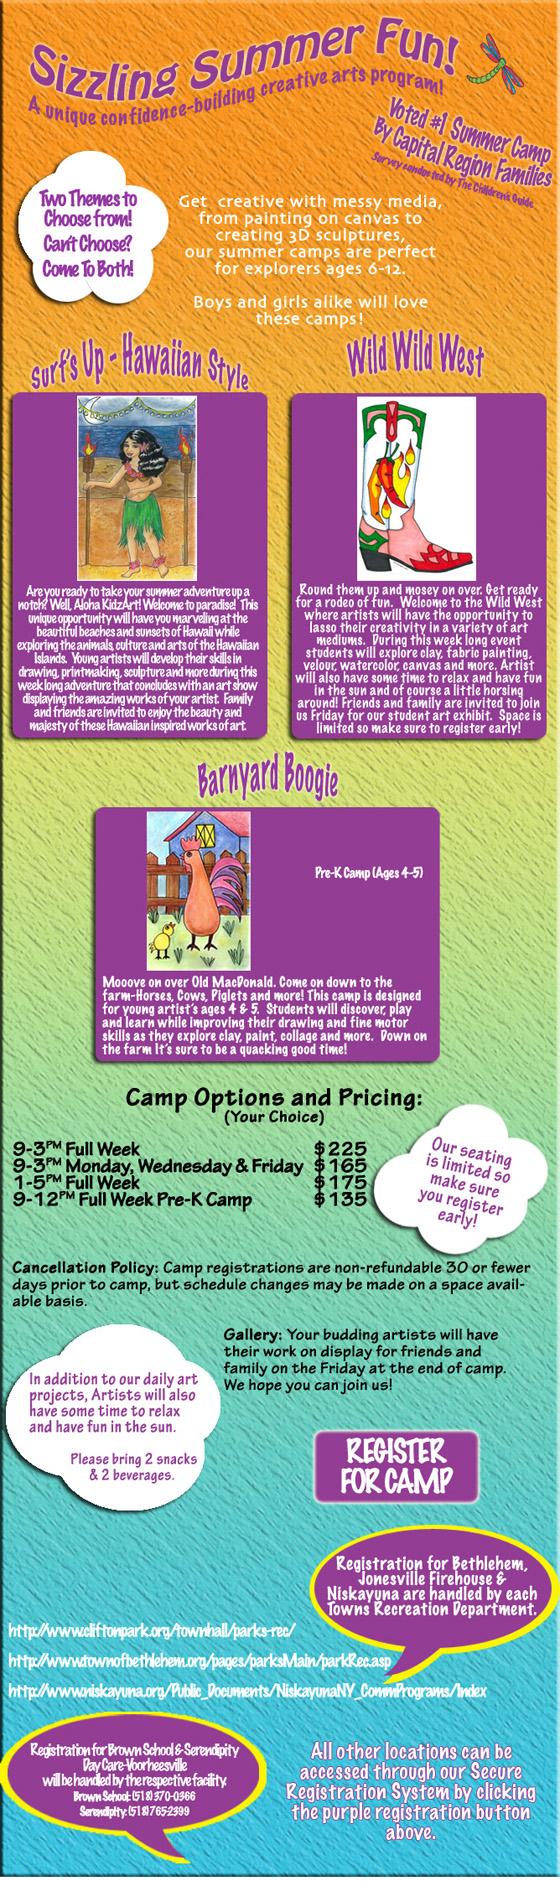 kids art camp Art for kids, Camping art, Art education